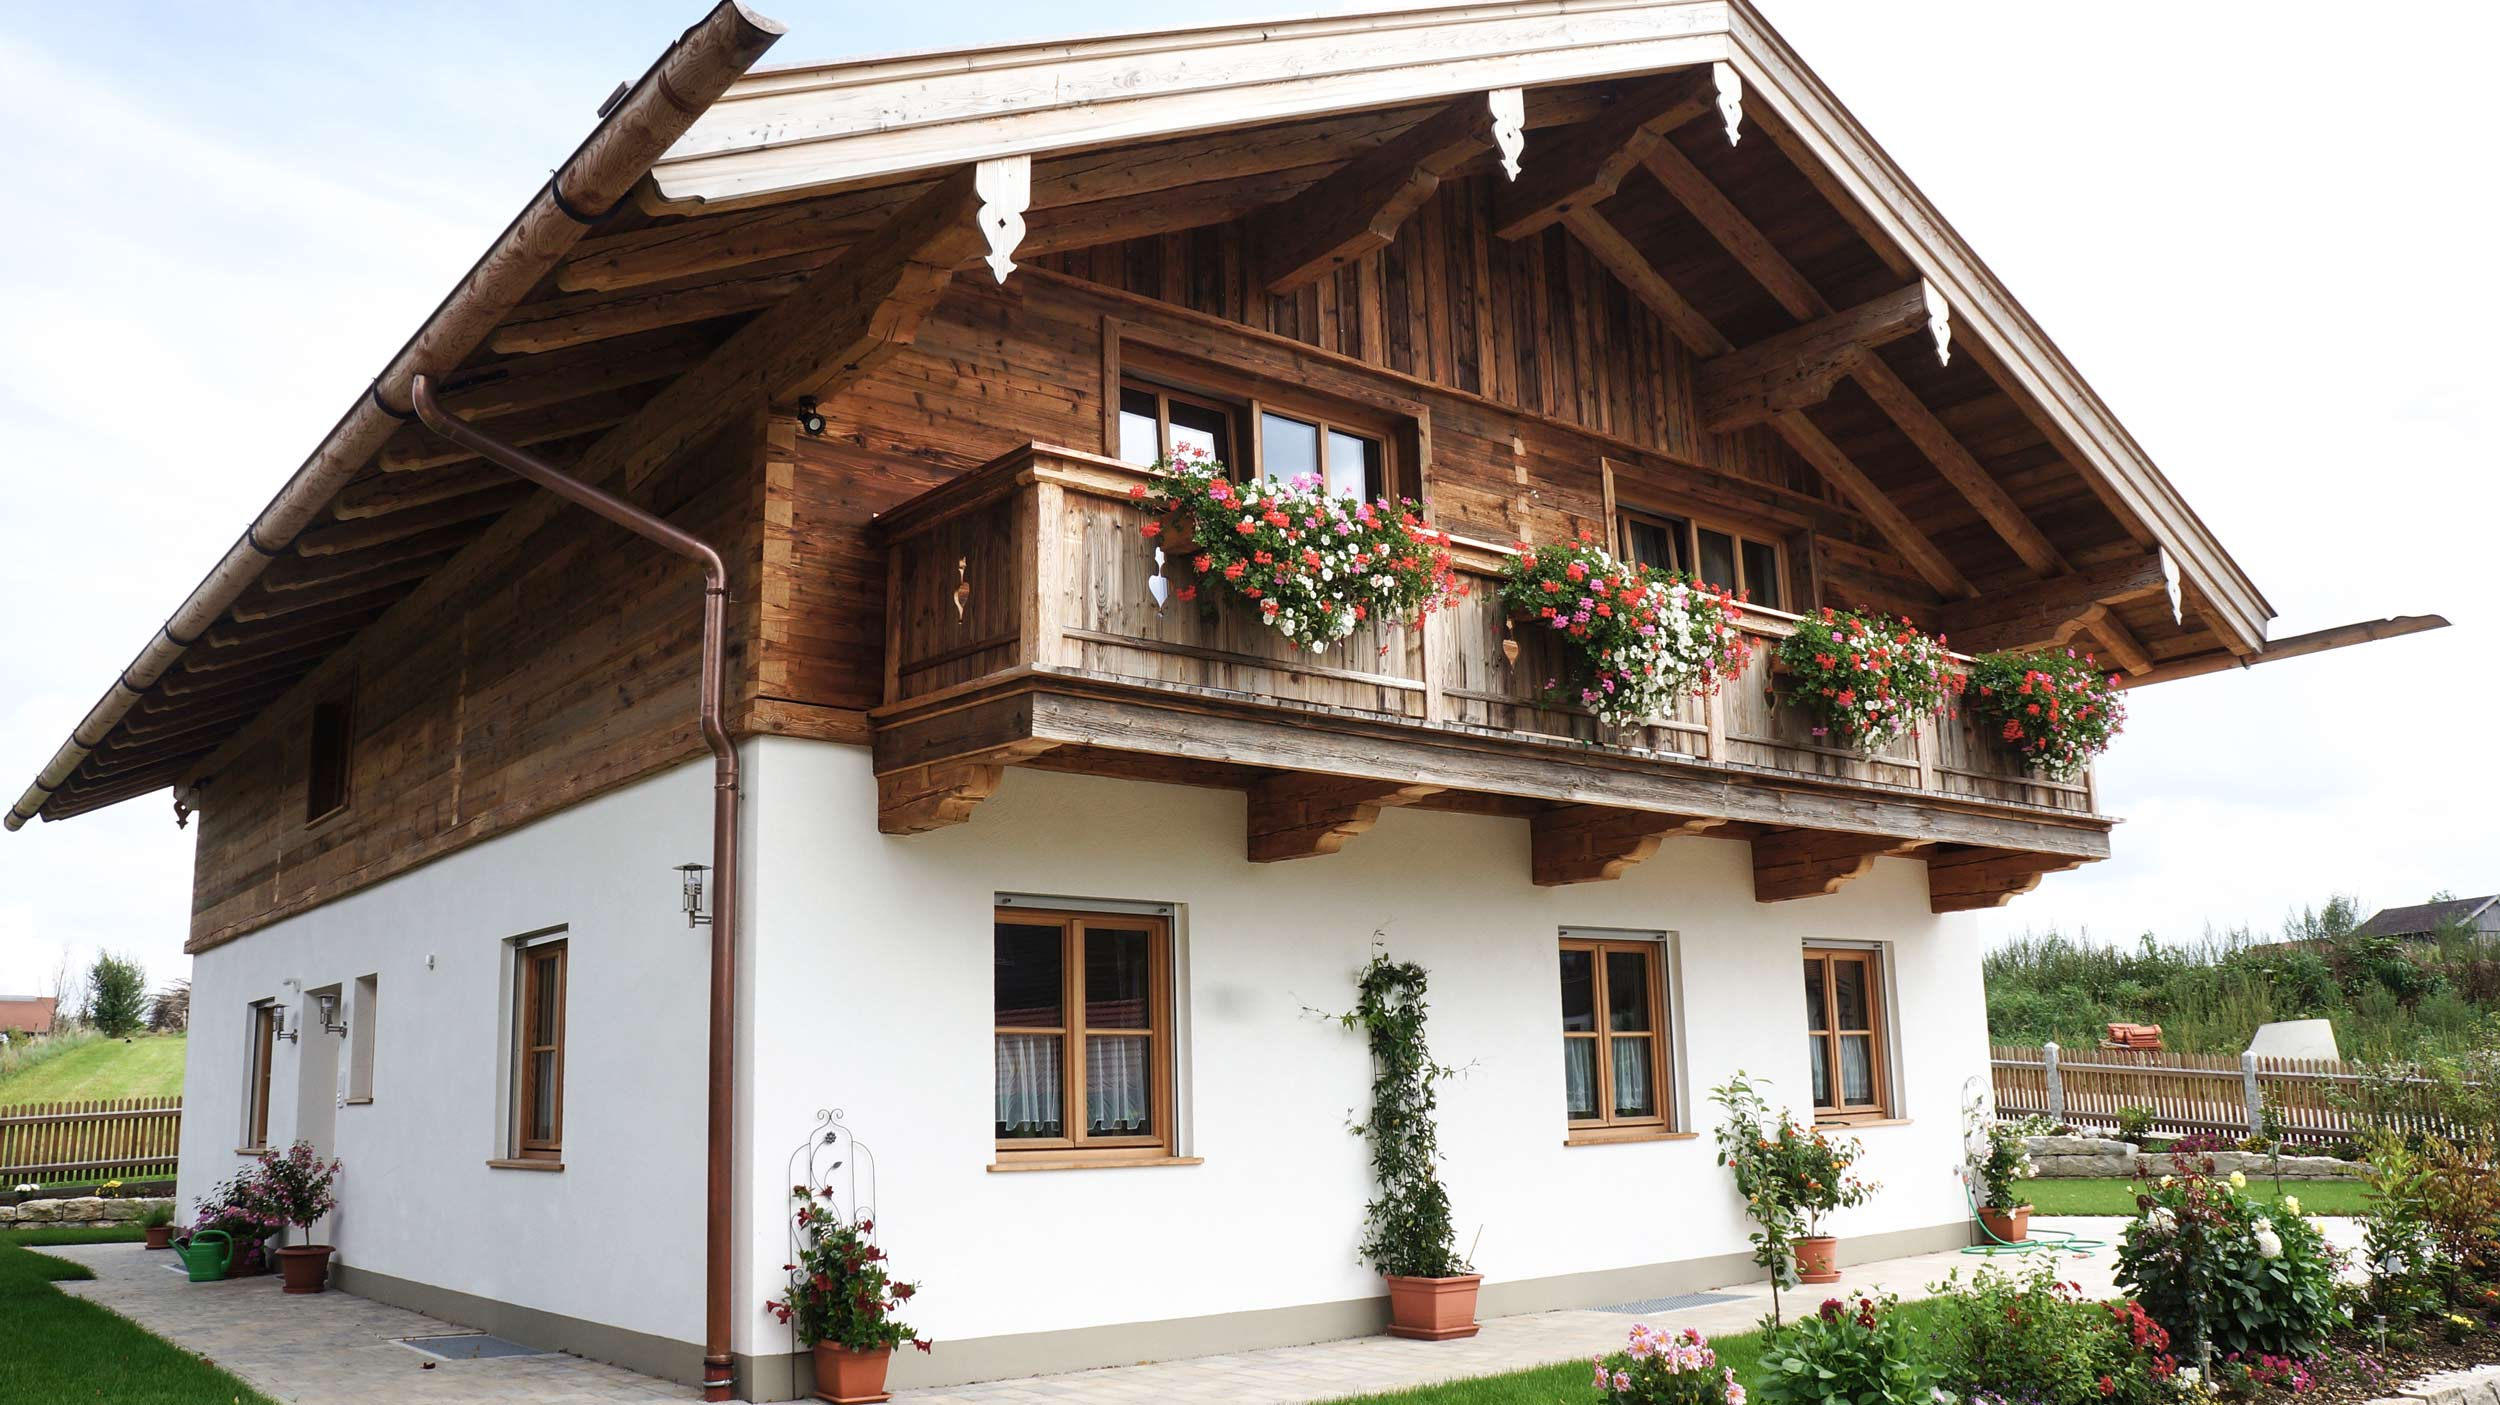 zimmerei-stoib-holzbau-holzhaus-altholz-fassade-blockschalung-balkon-dachstuhl-zaun-quergiebel-terrassentür-03.jpg